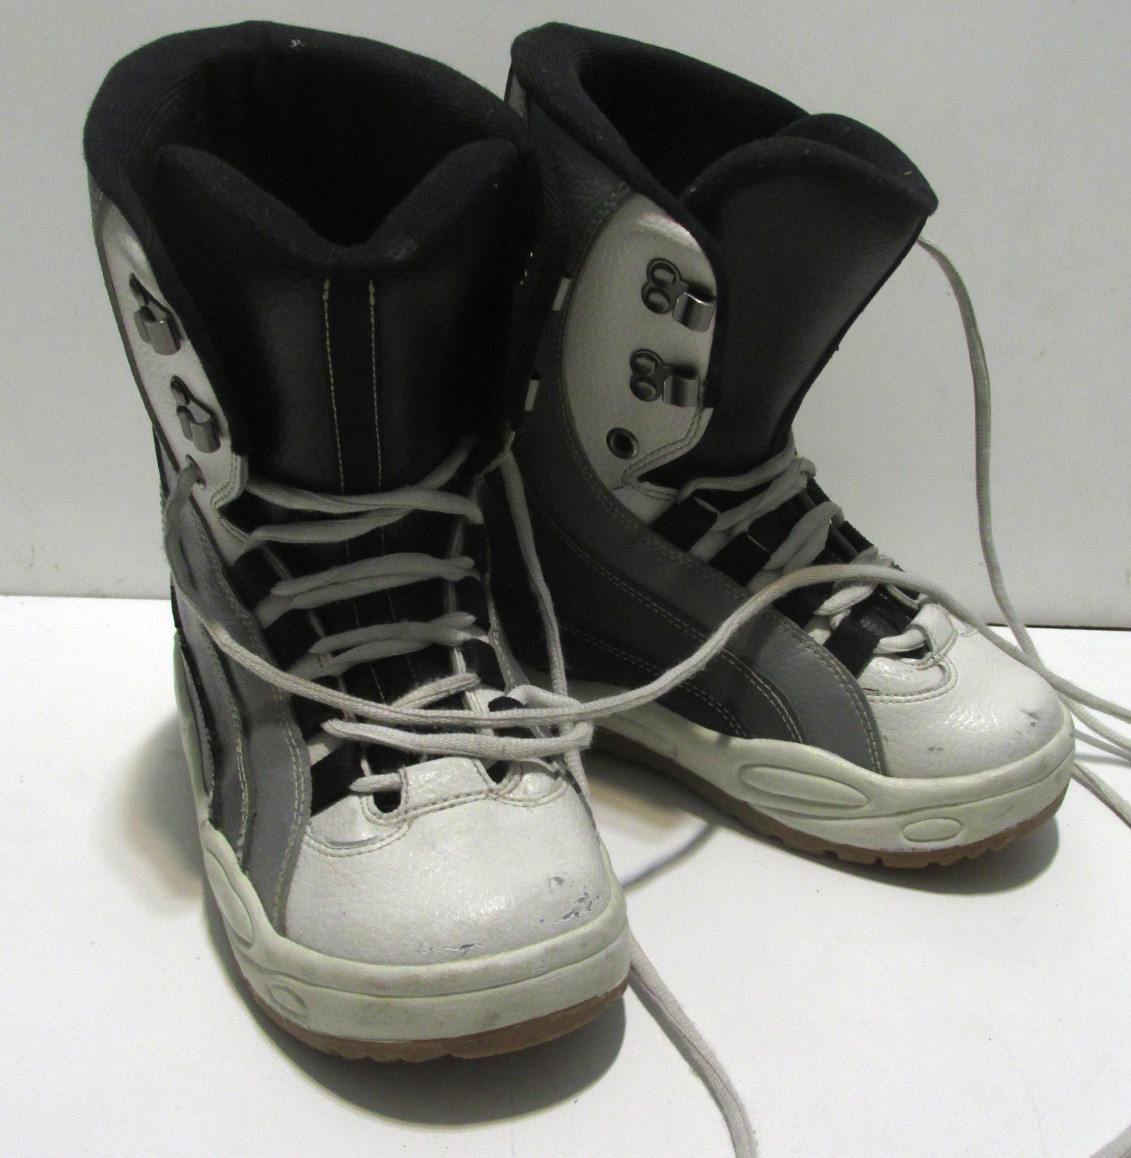 Ботинки для сноуборда SNOWBOARDS, 39 Уценка!